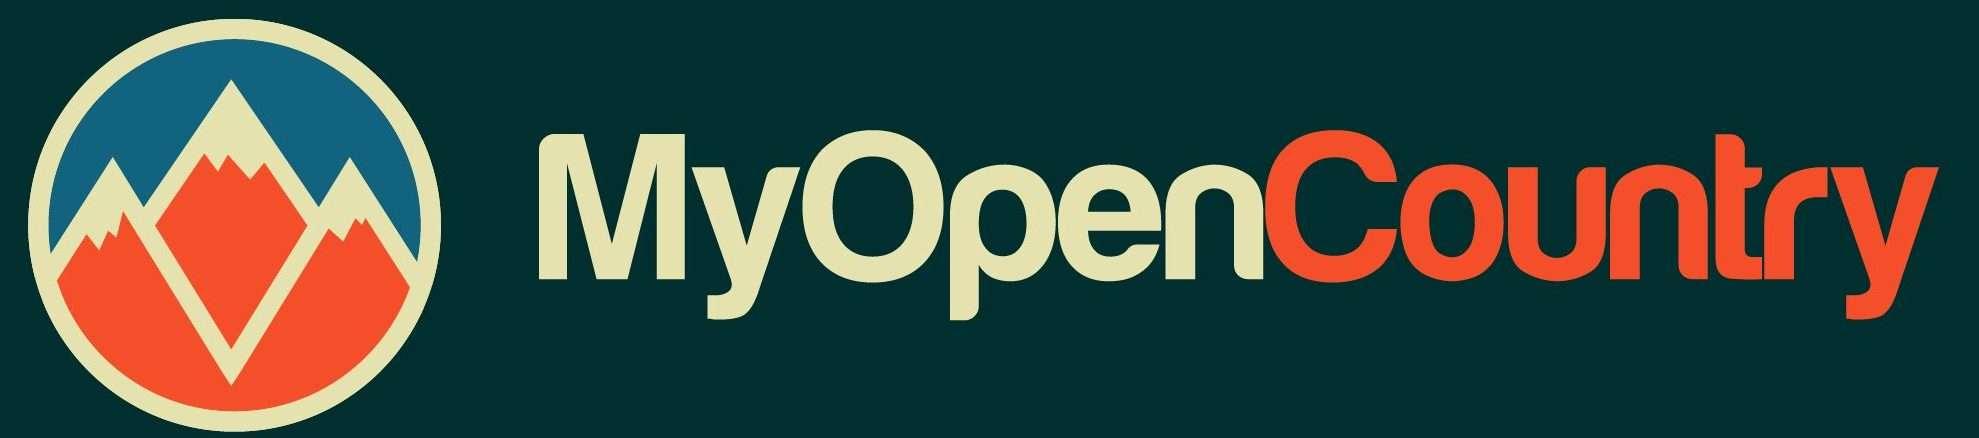 myopencountry-logo.jpg